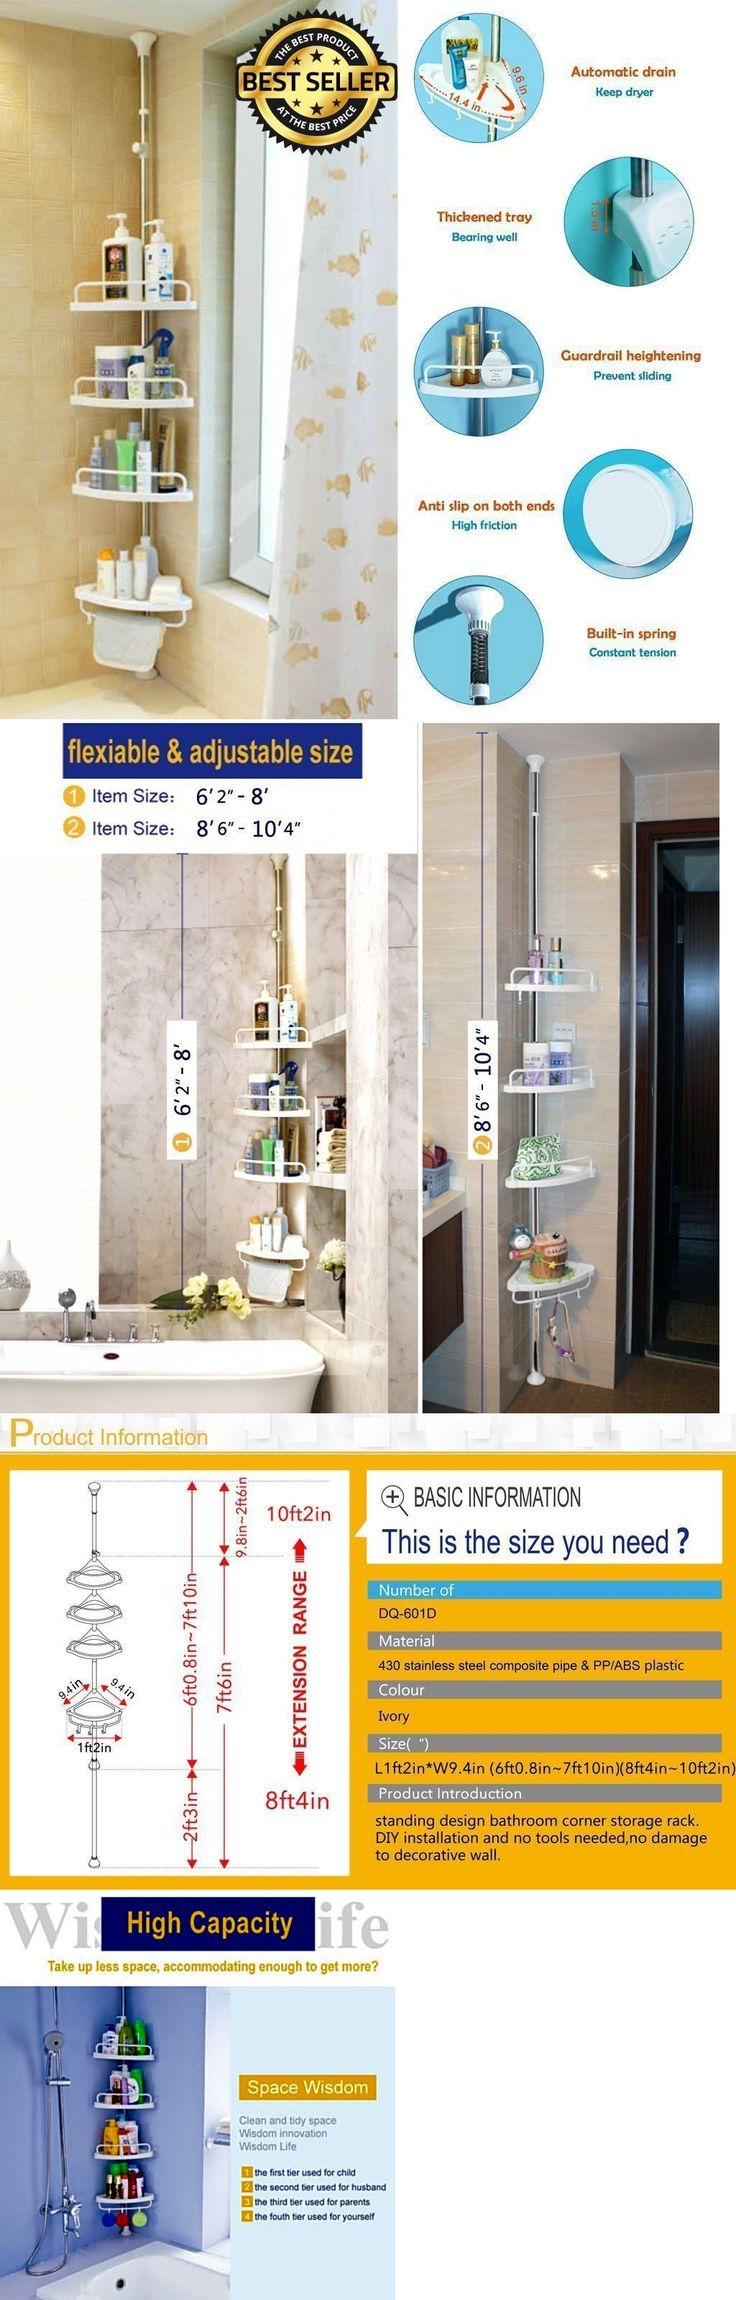 cele mai bune 25 de idei despre corner shower caddy pe pinterest bath caddies and storage 54075 4 tier bathroom constant tension pole corner shower caddy